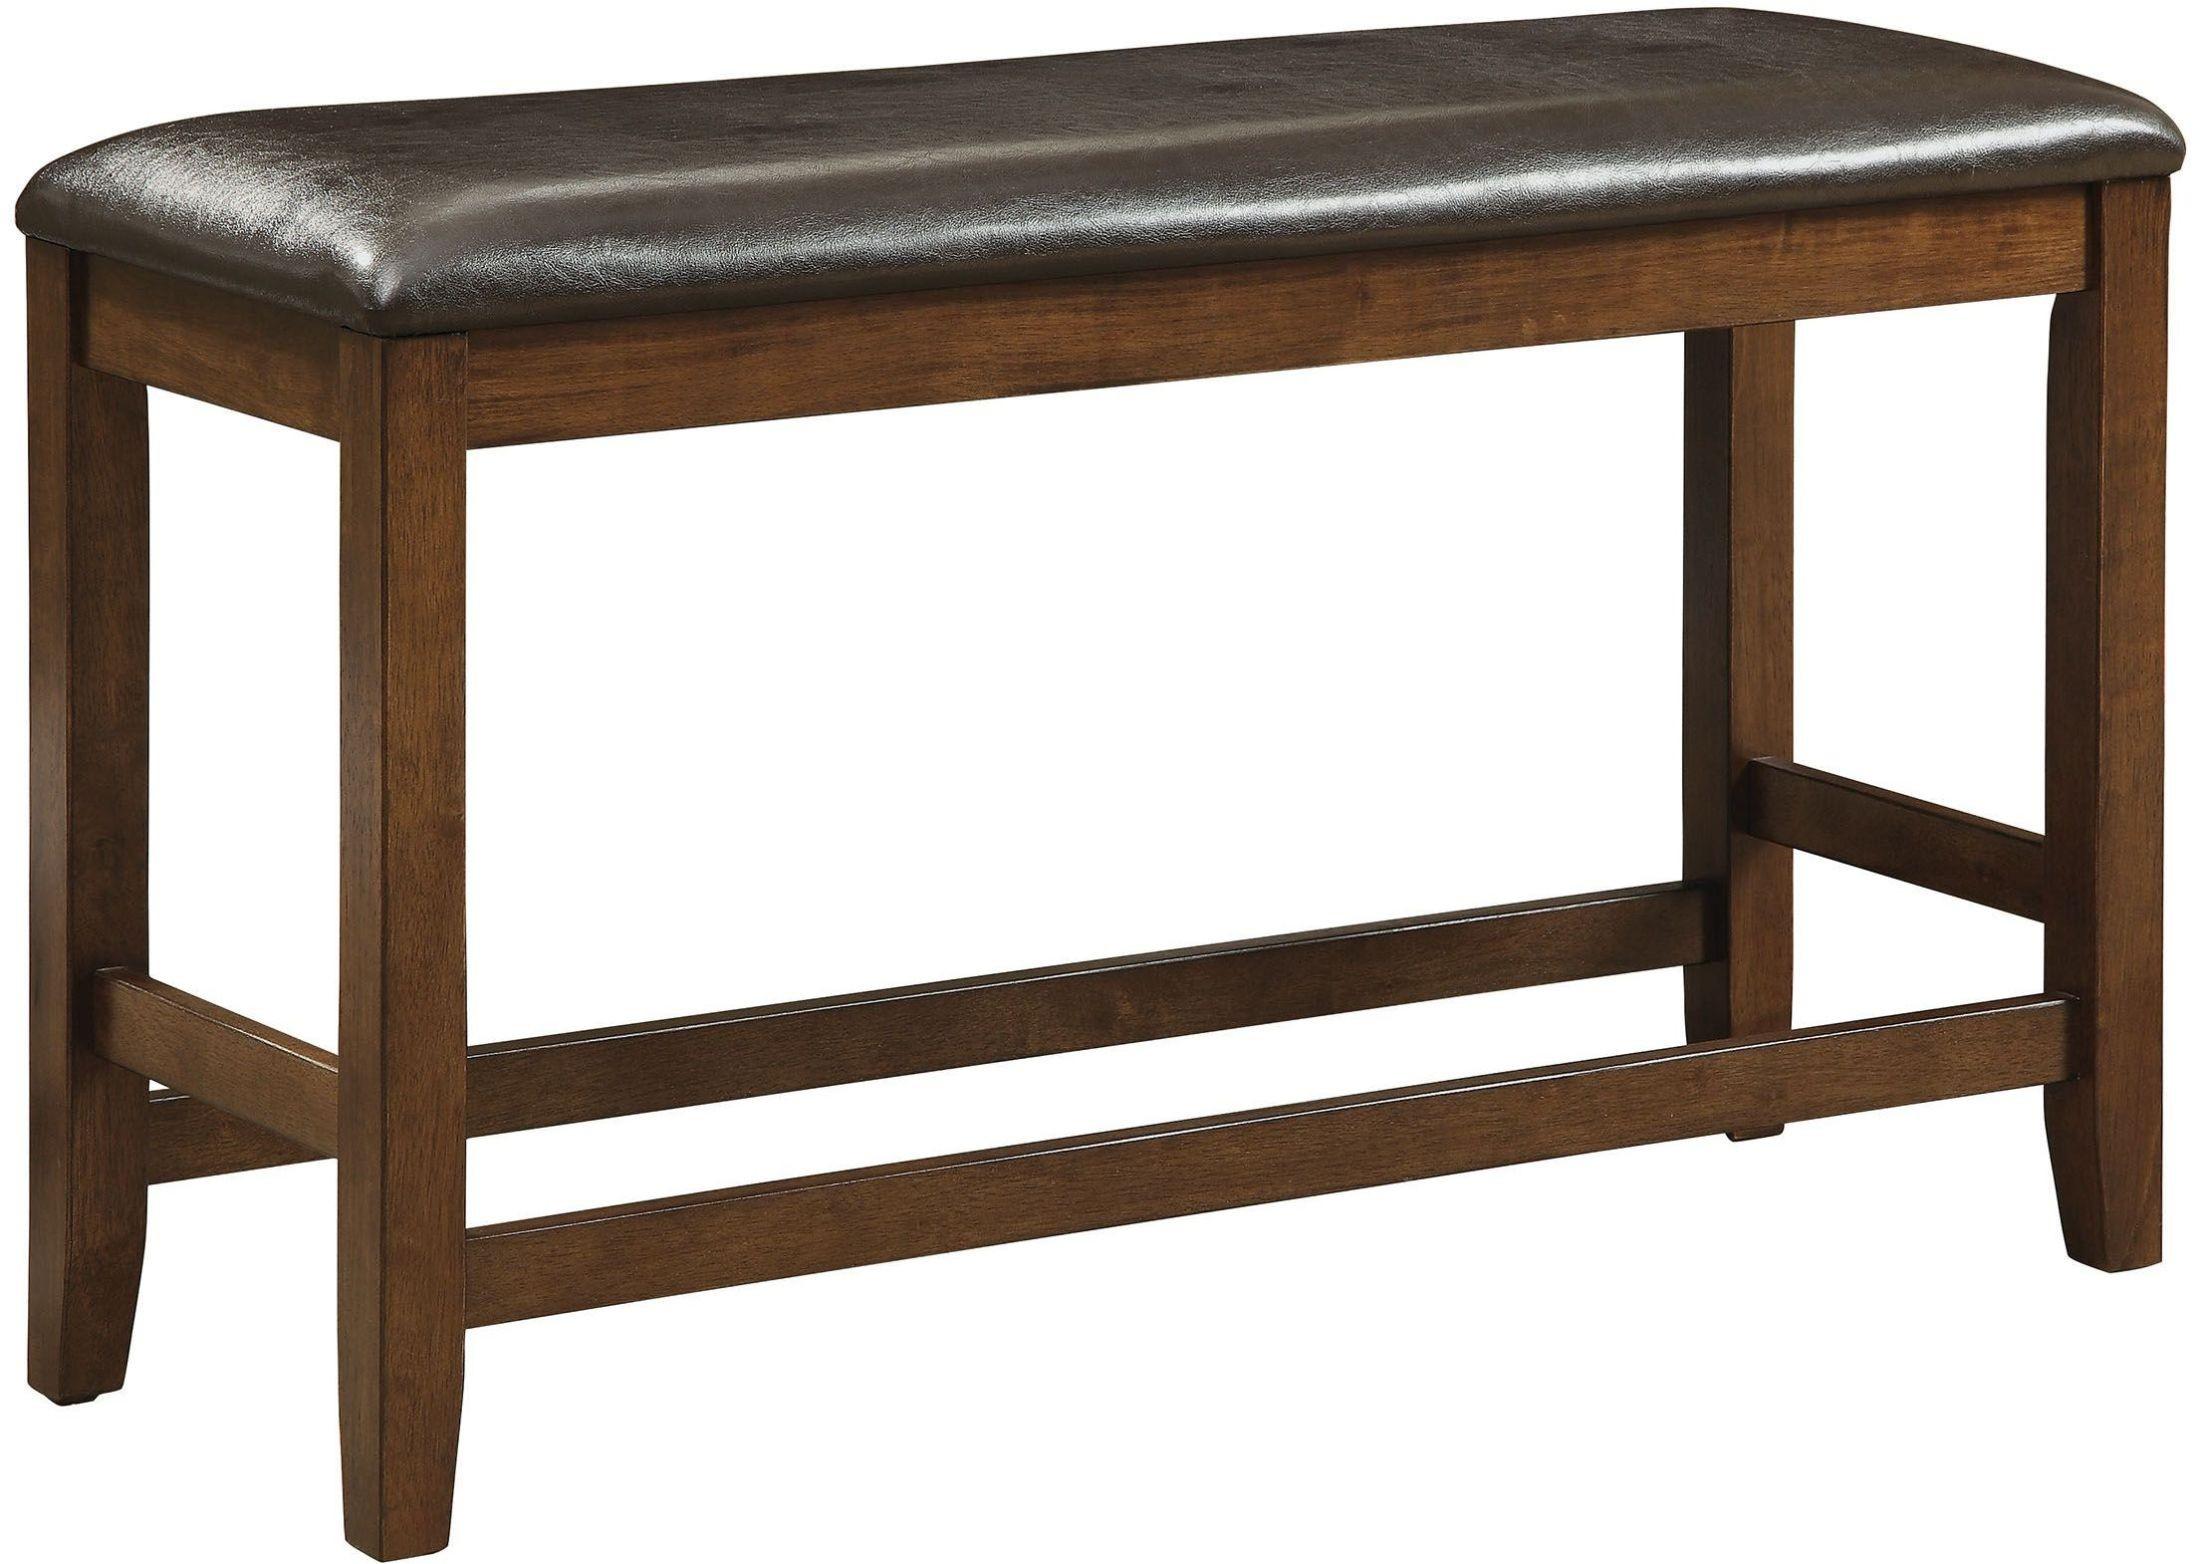 Brockton Ii Rustic Oak Counter Height Bench From Furniture Of America Coleman Furniture